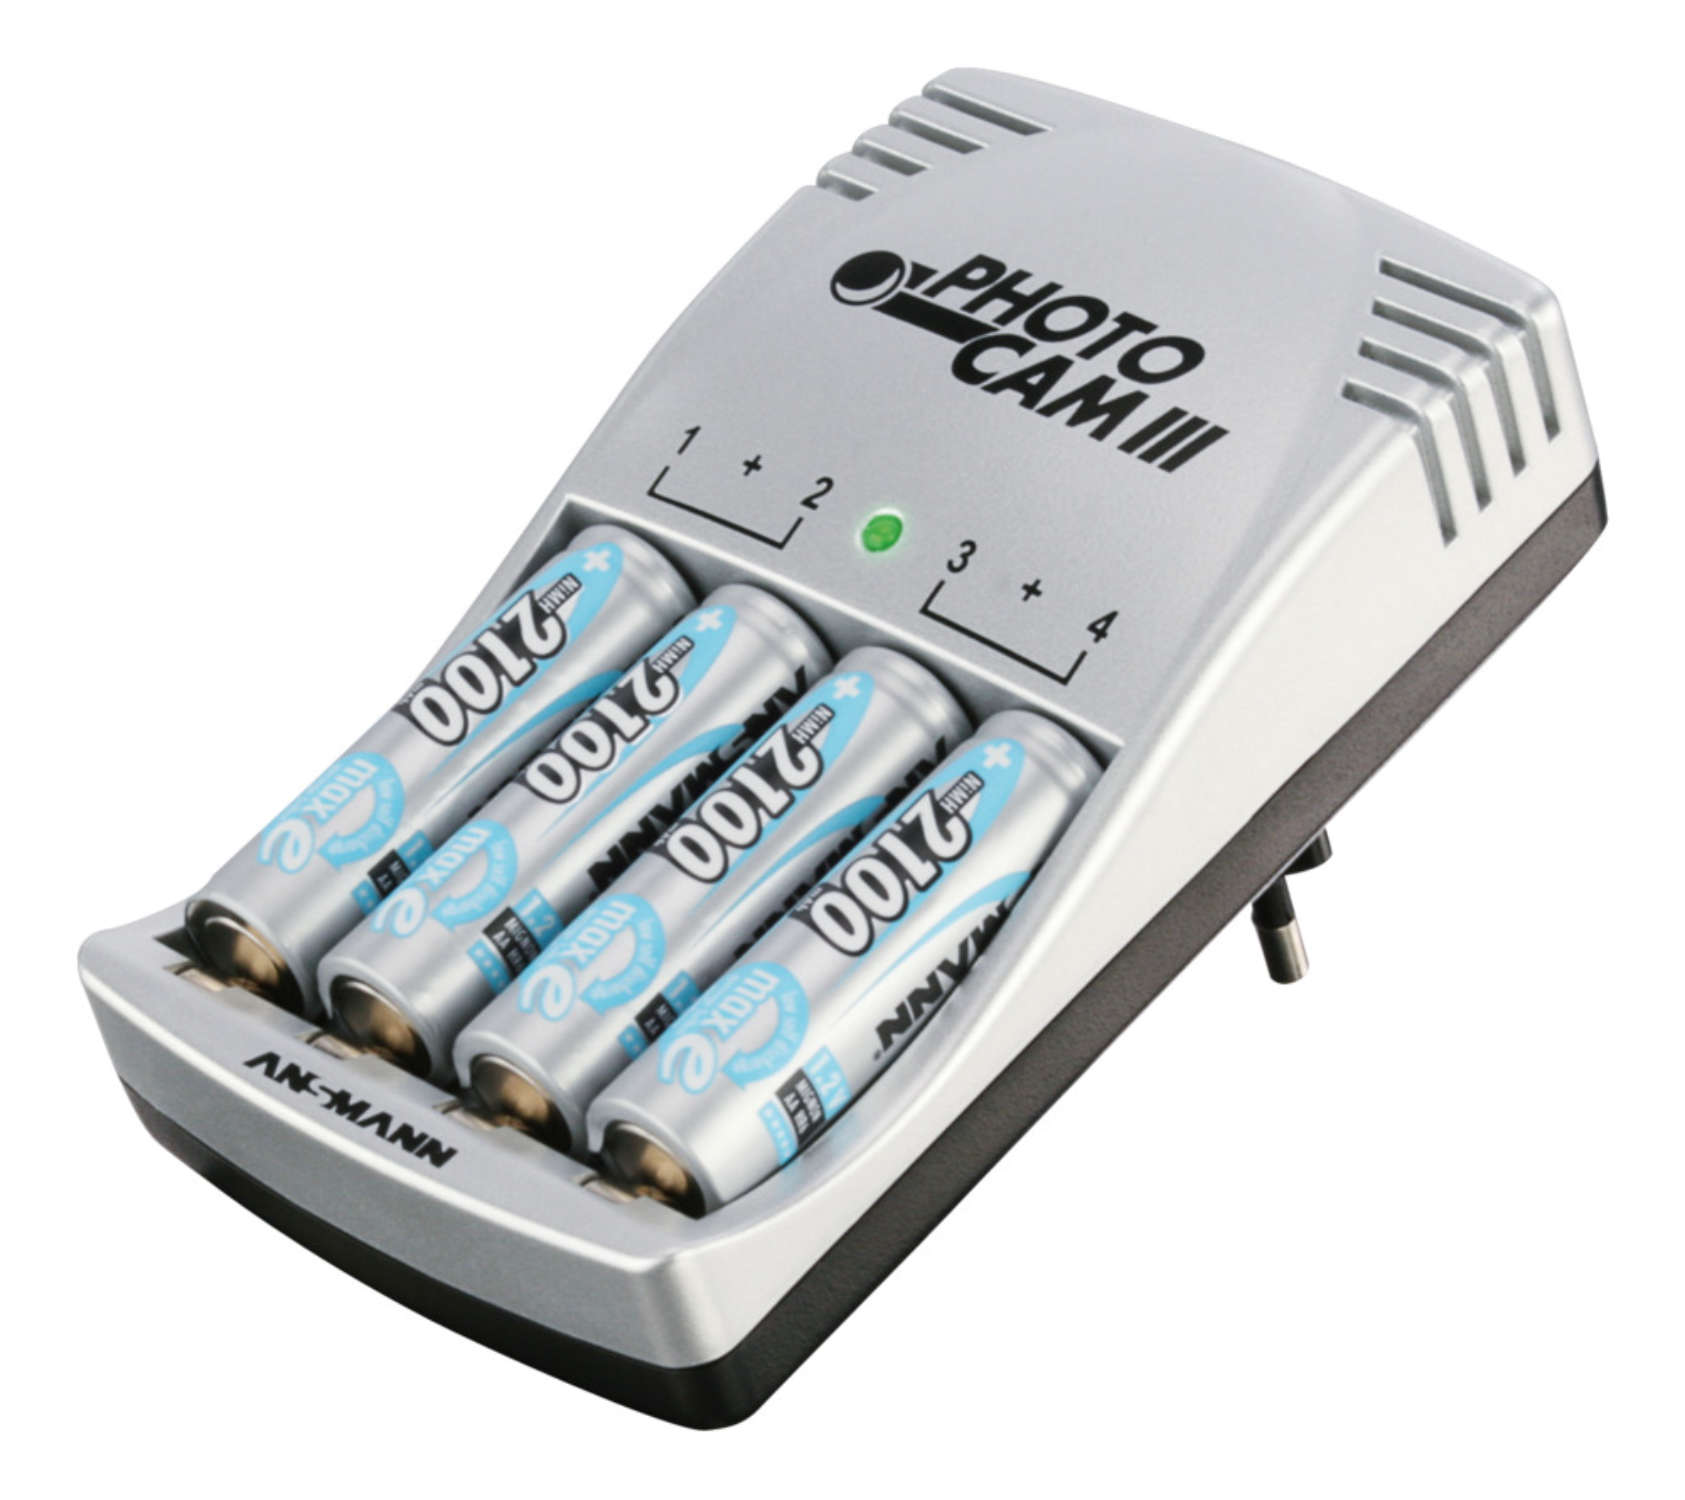 PhotoCam III + 4 Mignon AA NiMH batteries 2100mAh maxE